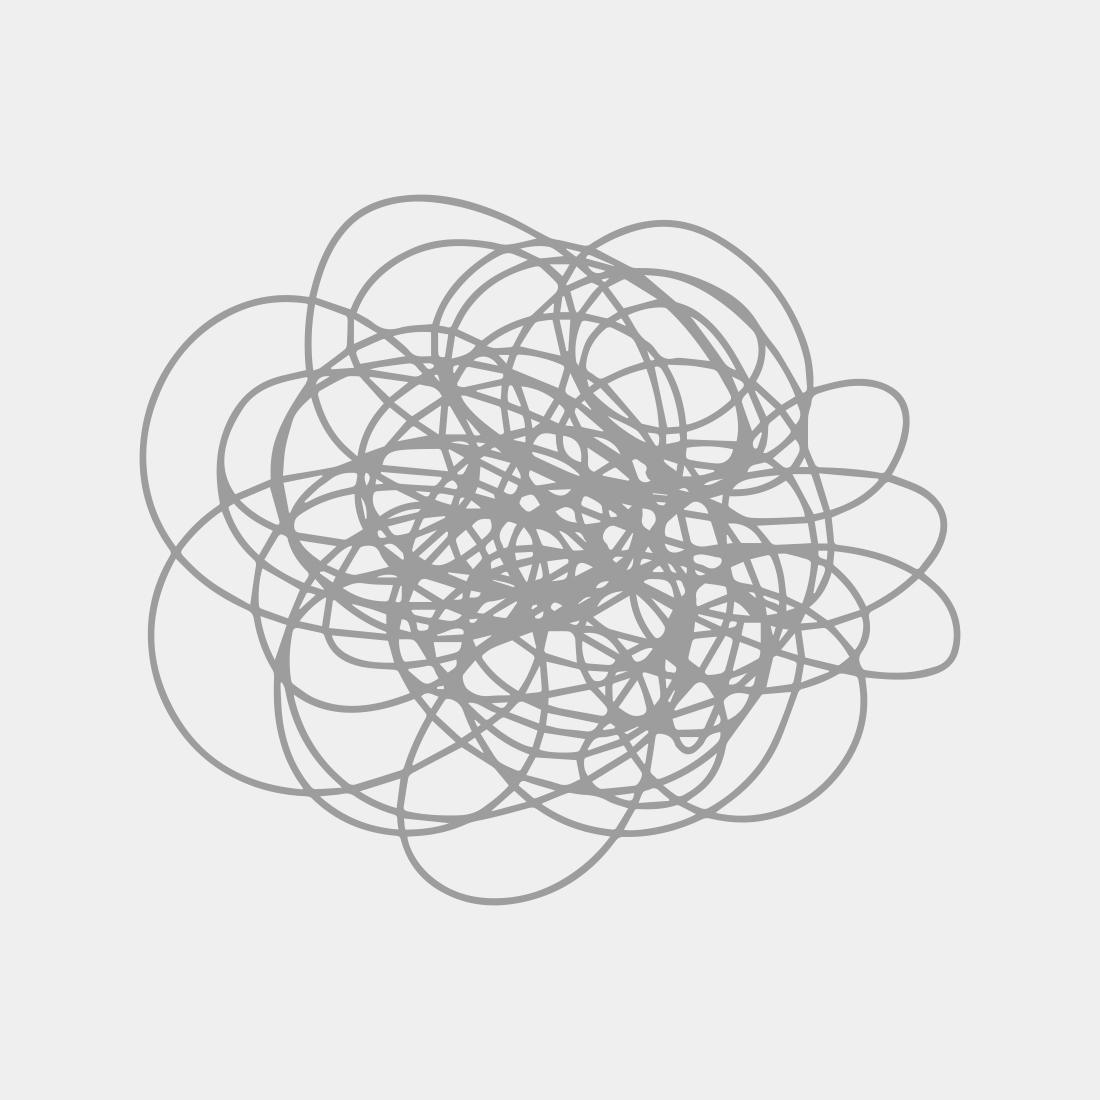 Galerie Louise Leiris, Peintures 1955-1956